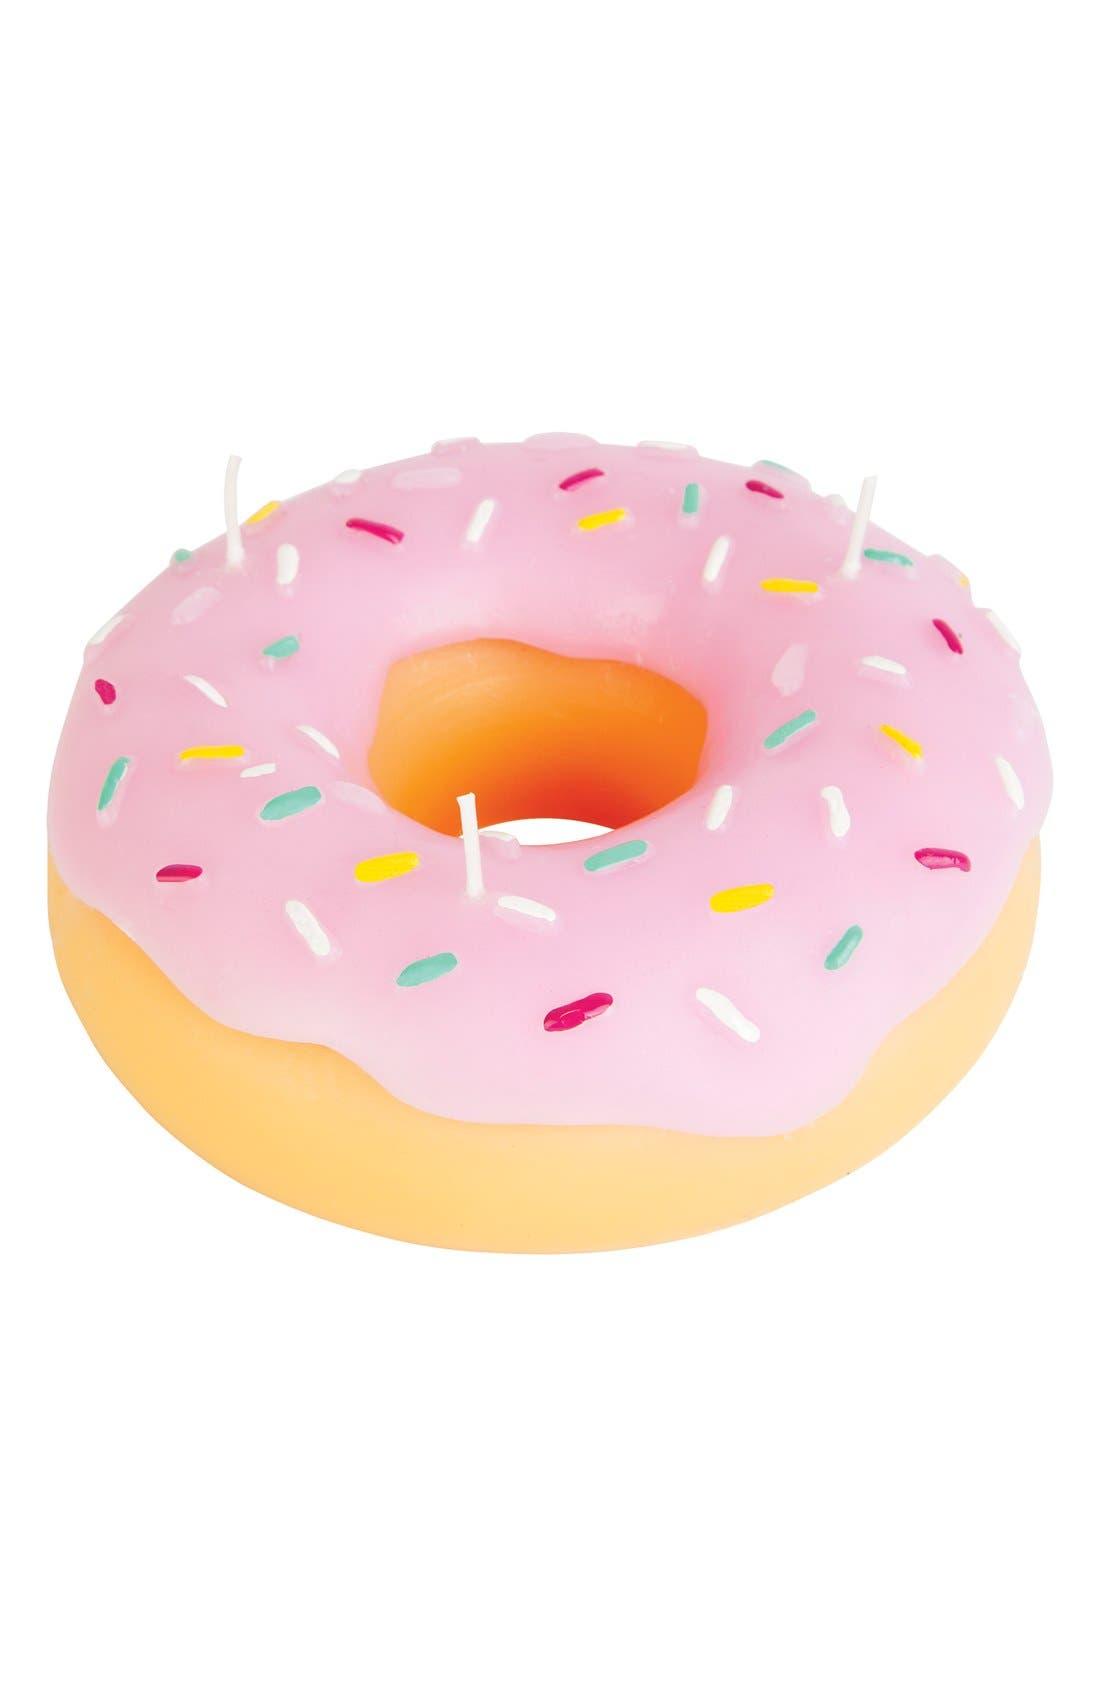 Donut Candle,                             Main thumbnail 1, color,                             650